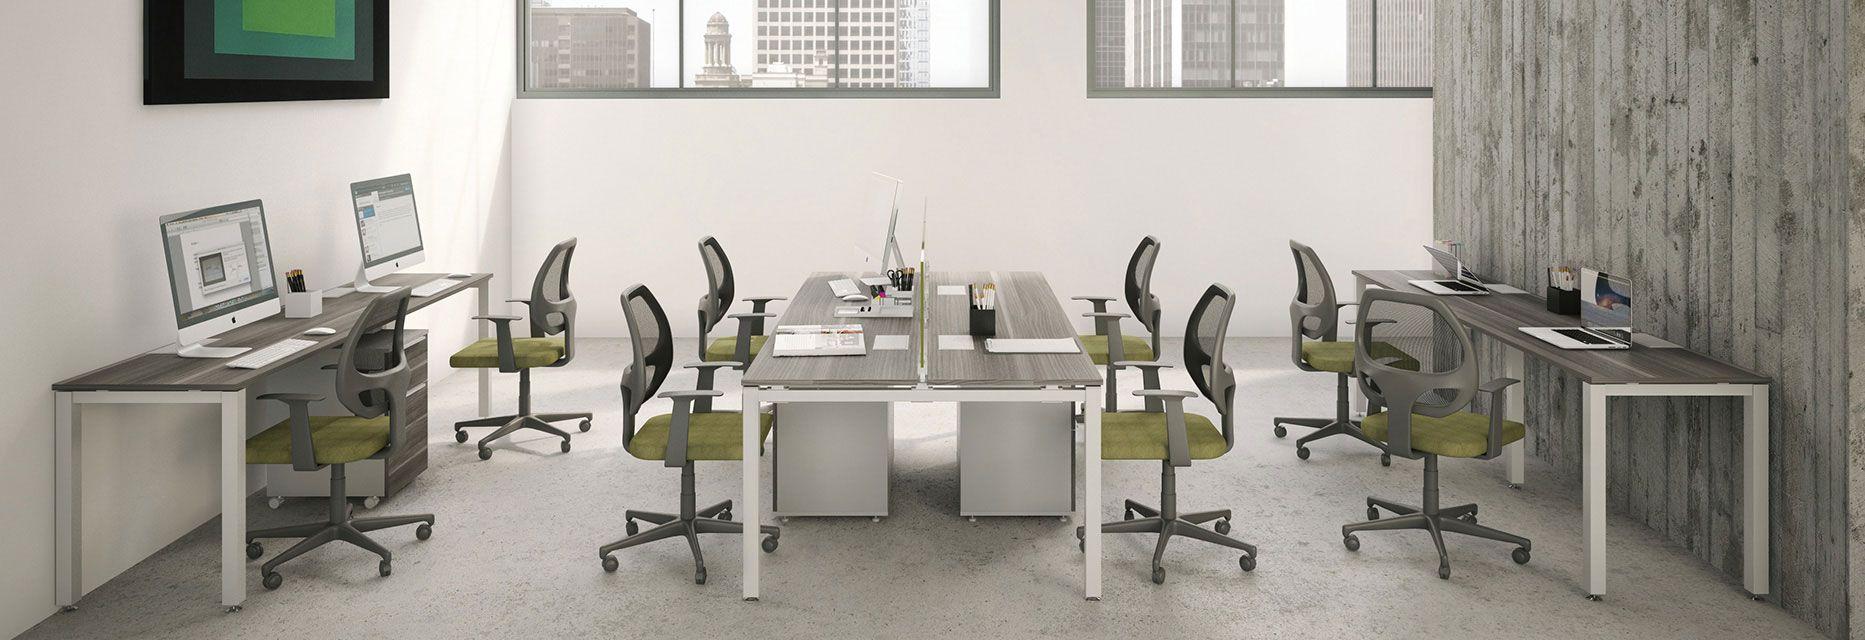 Muebles De Oficina En Querétaro Mobiliario Oficina Muebles De Oficina Muebles